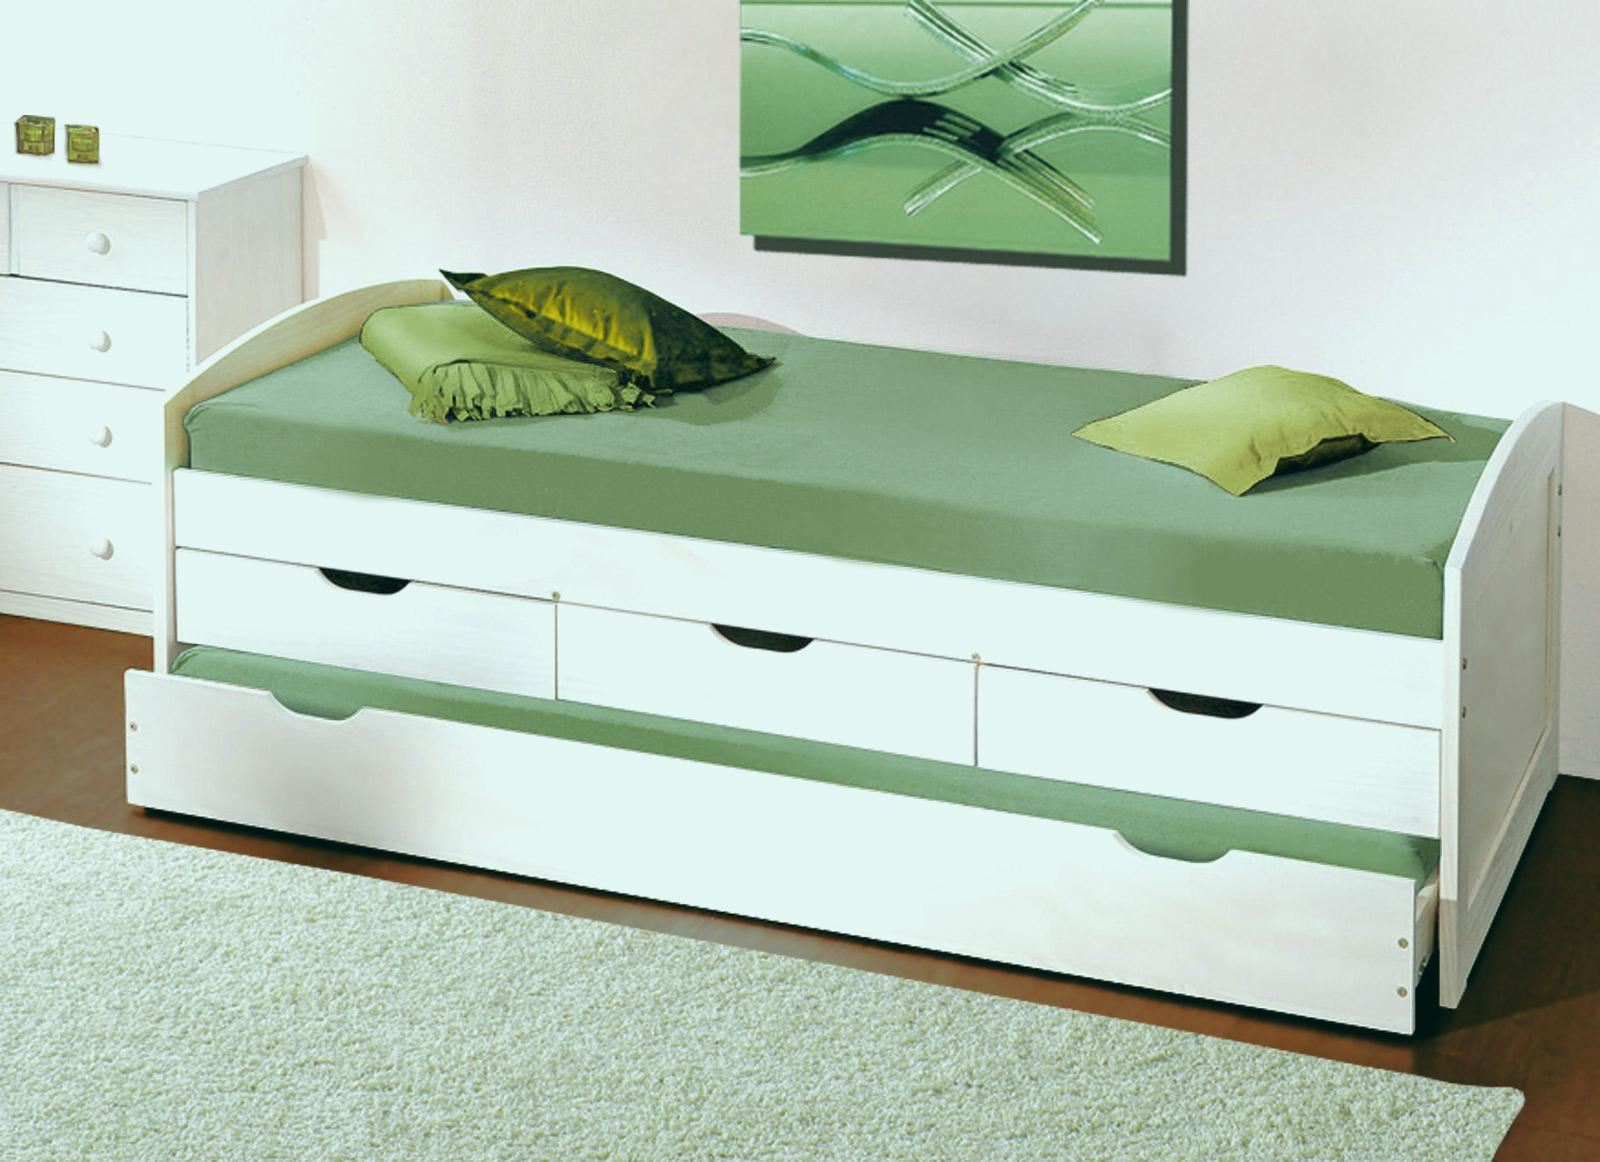 Full Size of Bett Mit Ausziehbett Ikea Vintage Barock Lattenrost Betten Kaufen Rückwand Kolonialstil 90x200 Und Matratze Sofa Schlaffunktion 140x200 Günstig 180x200 Wohnzimmer Bett Mit Ausziehbett Ikea